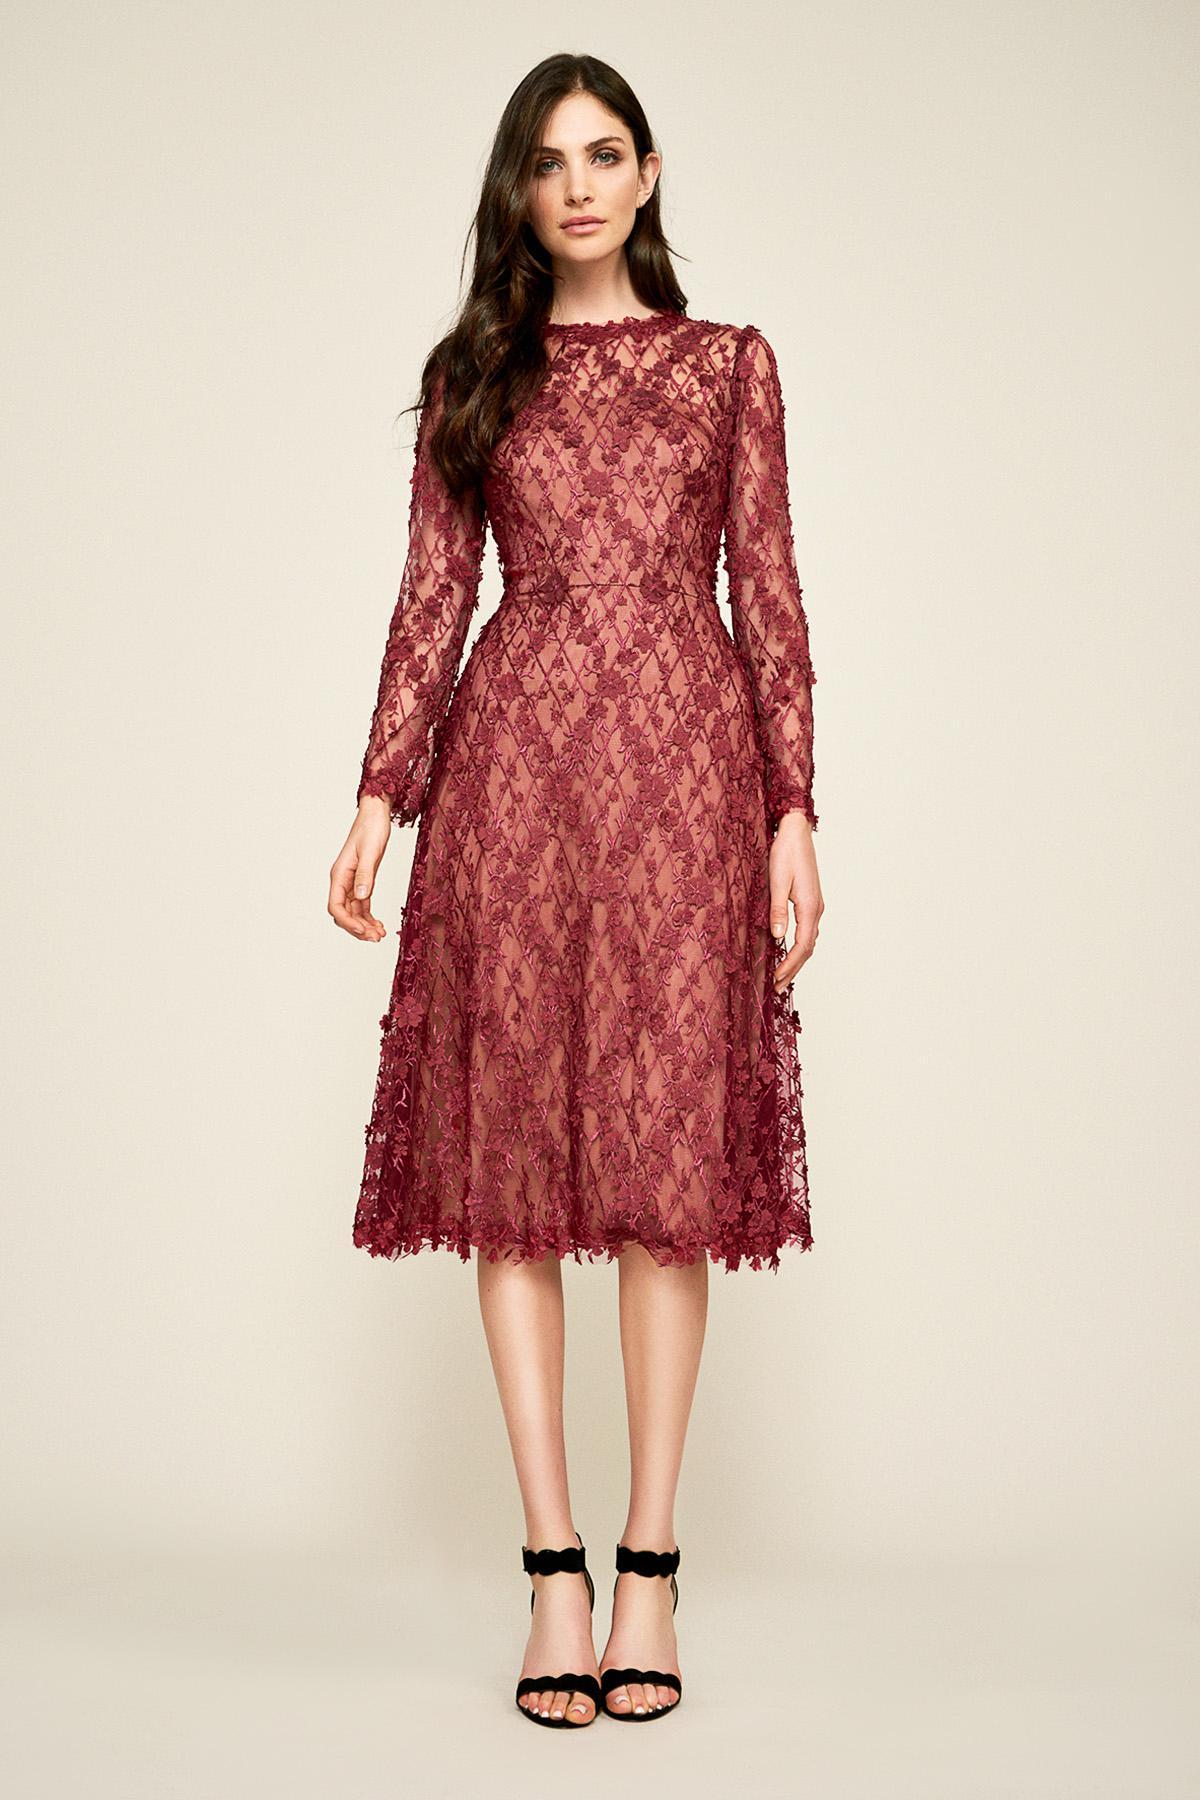 c94fe81e0c003 Tadashi Shoji. Women s Red Binx Embroidery Tea-length Dress